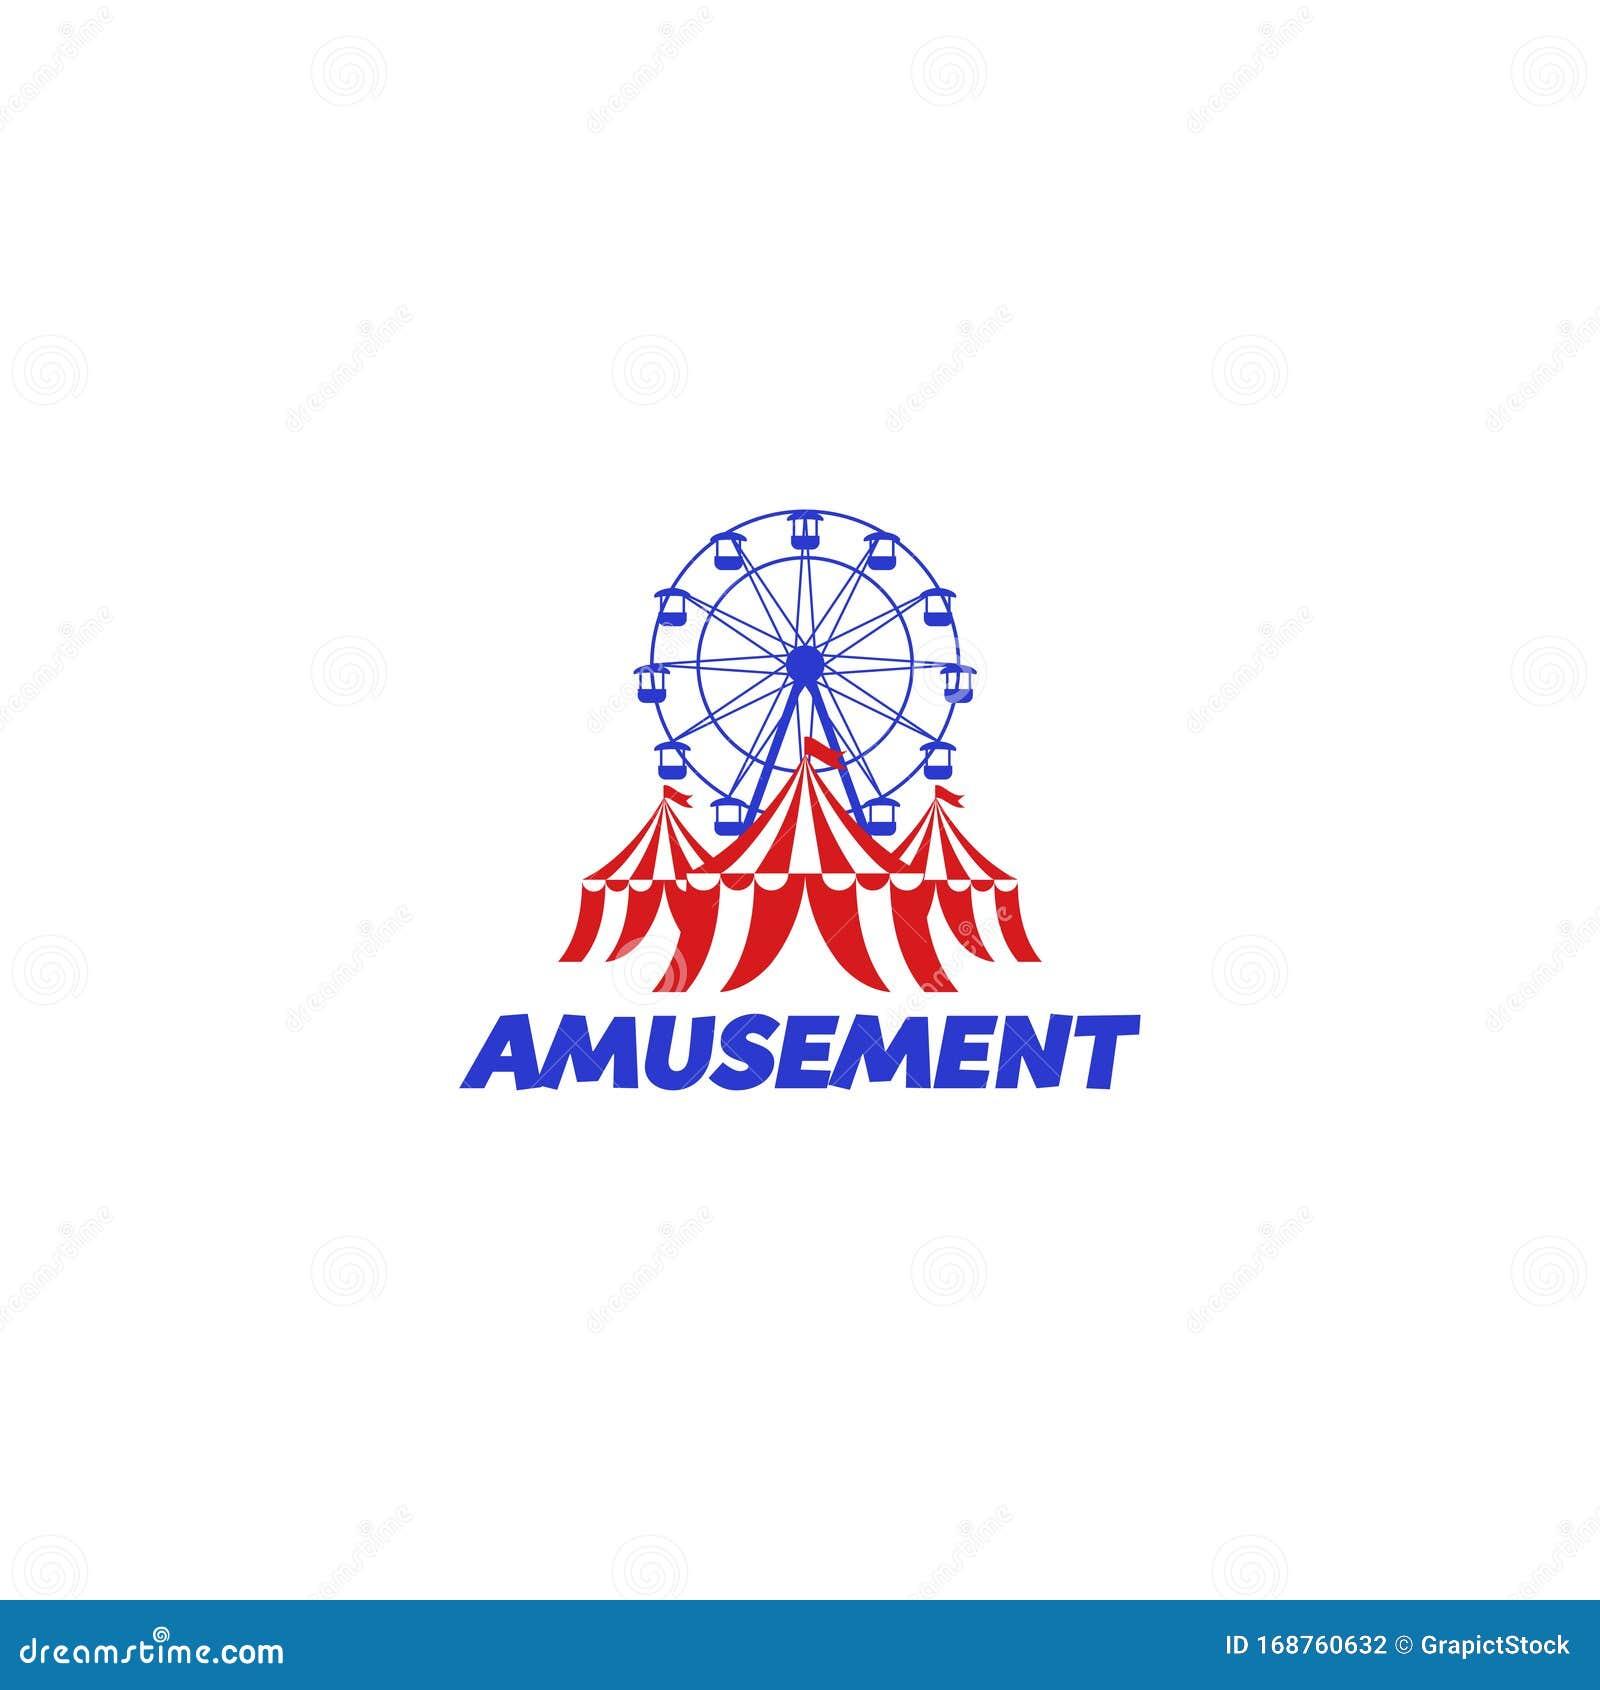 Amusement Park Fun Park Or Adventure Park Stock Vector Illustration Of Concept Circus 168760632